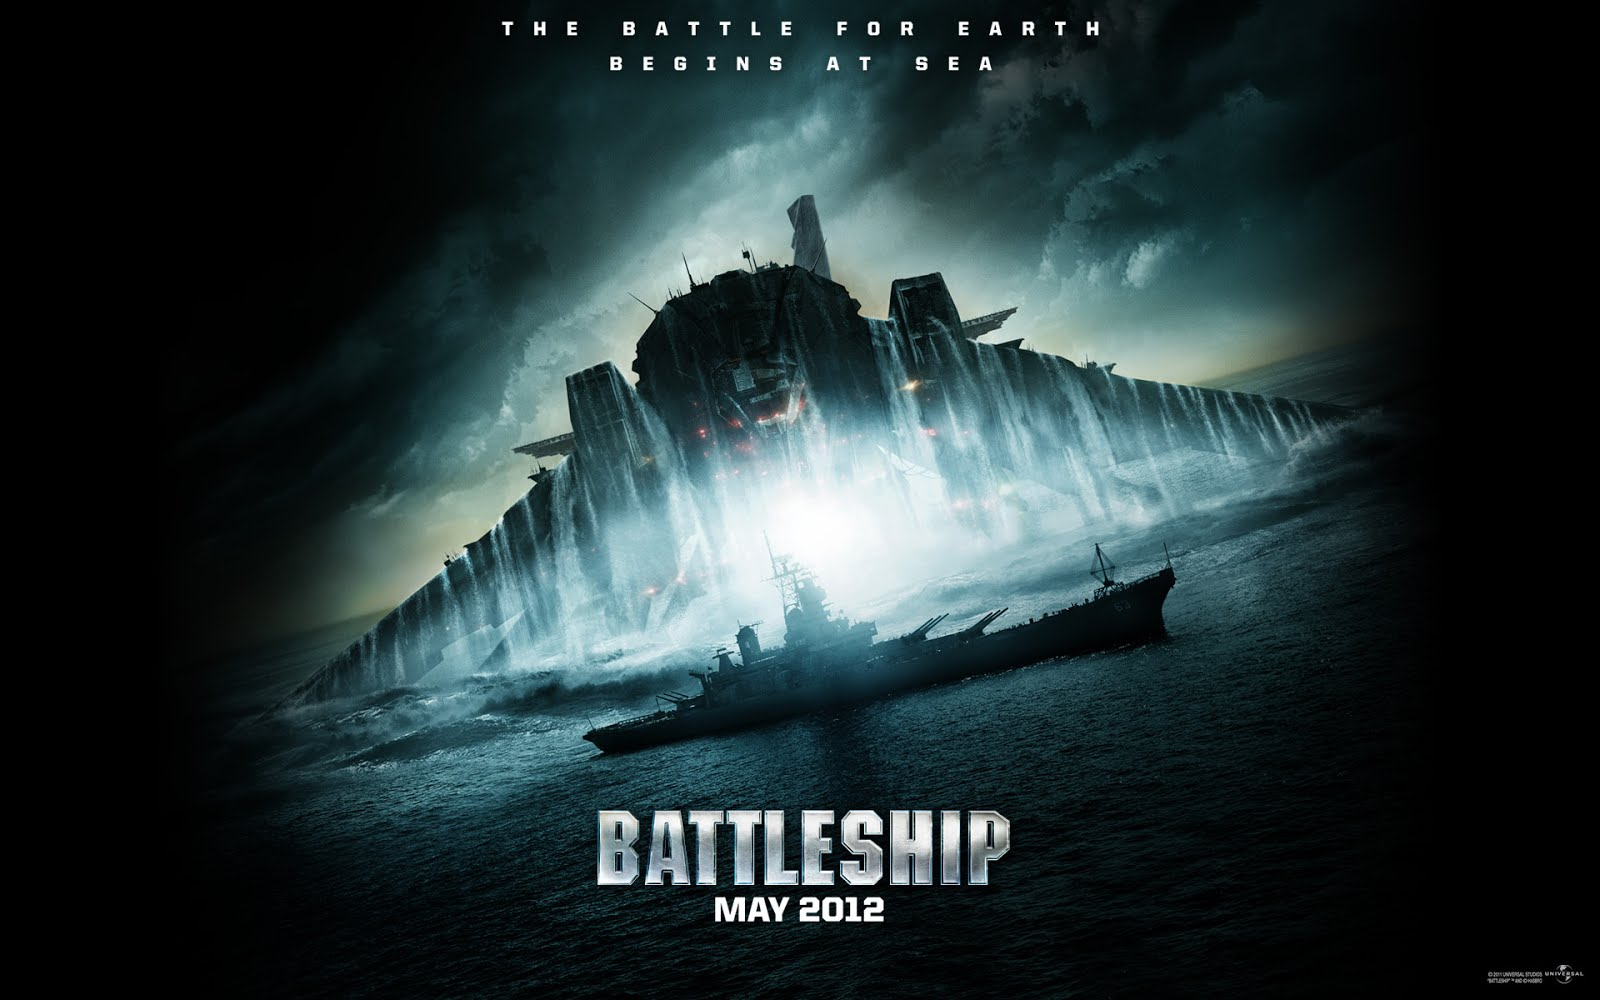 http://1.bp.blogspot.com/-Lk204c7e6D4/UKXhSgF_iHI/AAAAAAAAJHc/mRHfLJ14IEA/s1600/battleship-2012-movie-poster.jpg